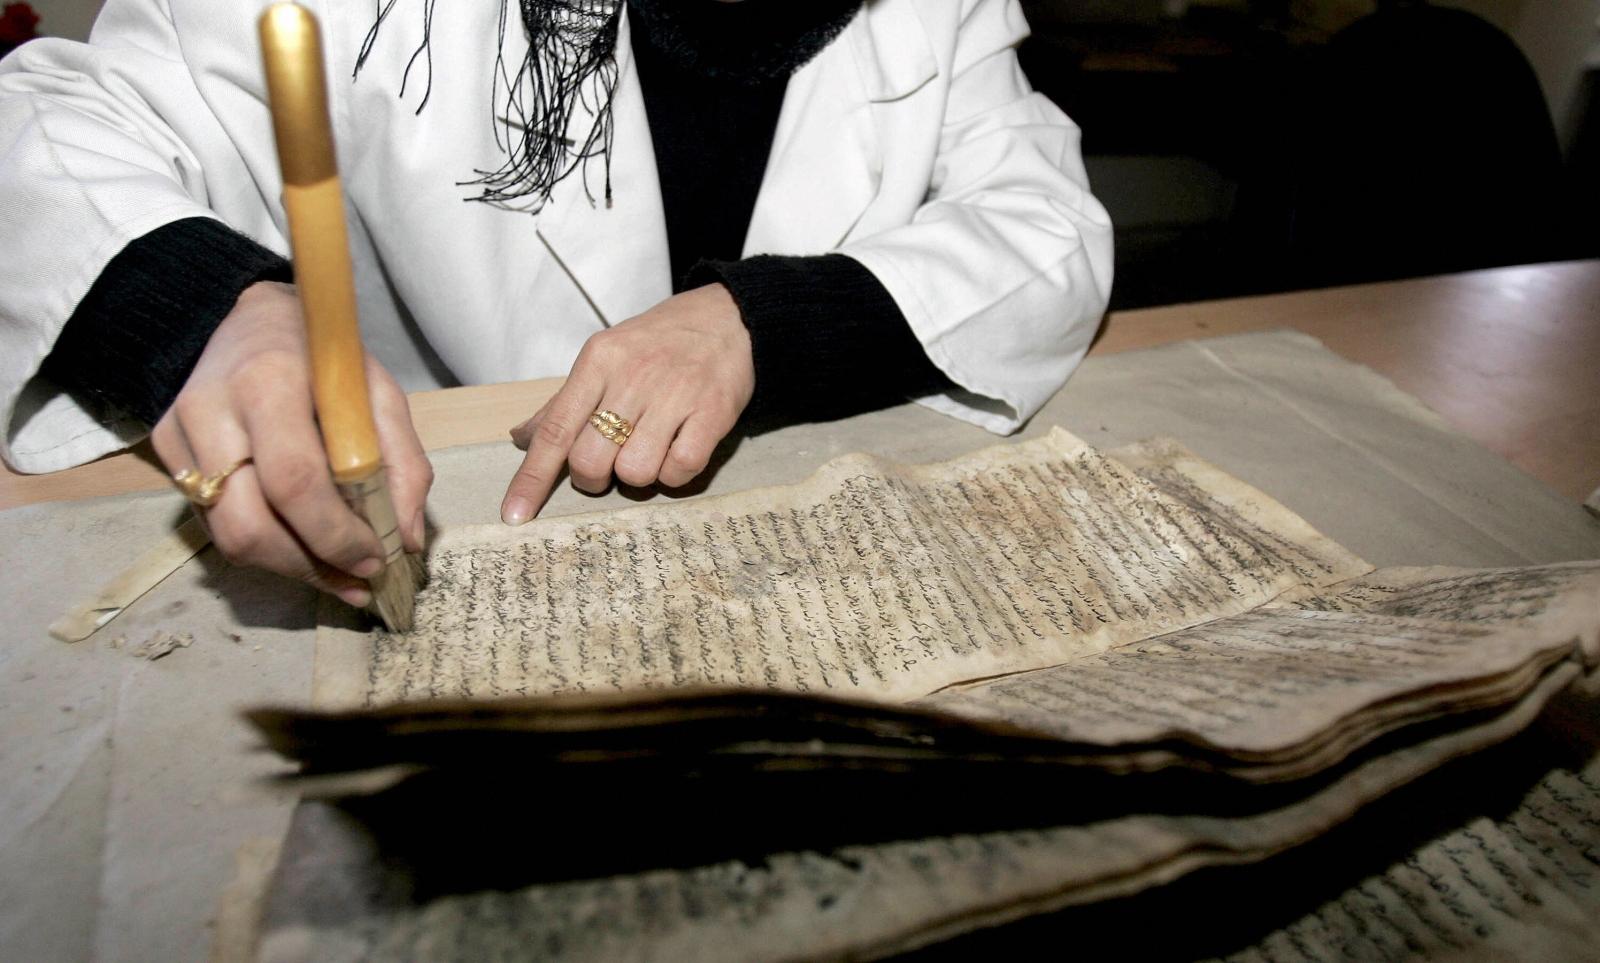 An expert restores a manuscript at BaghdadNationalLibrary